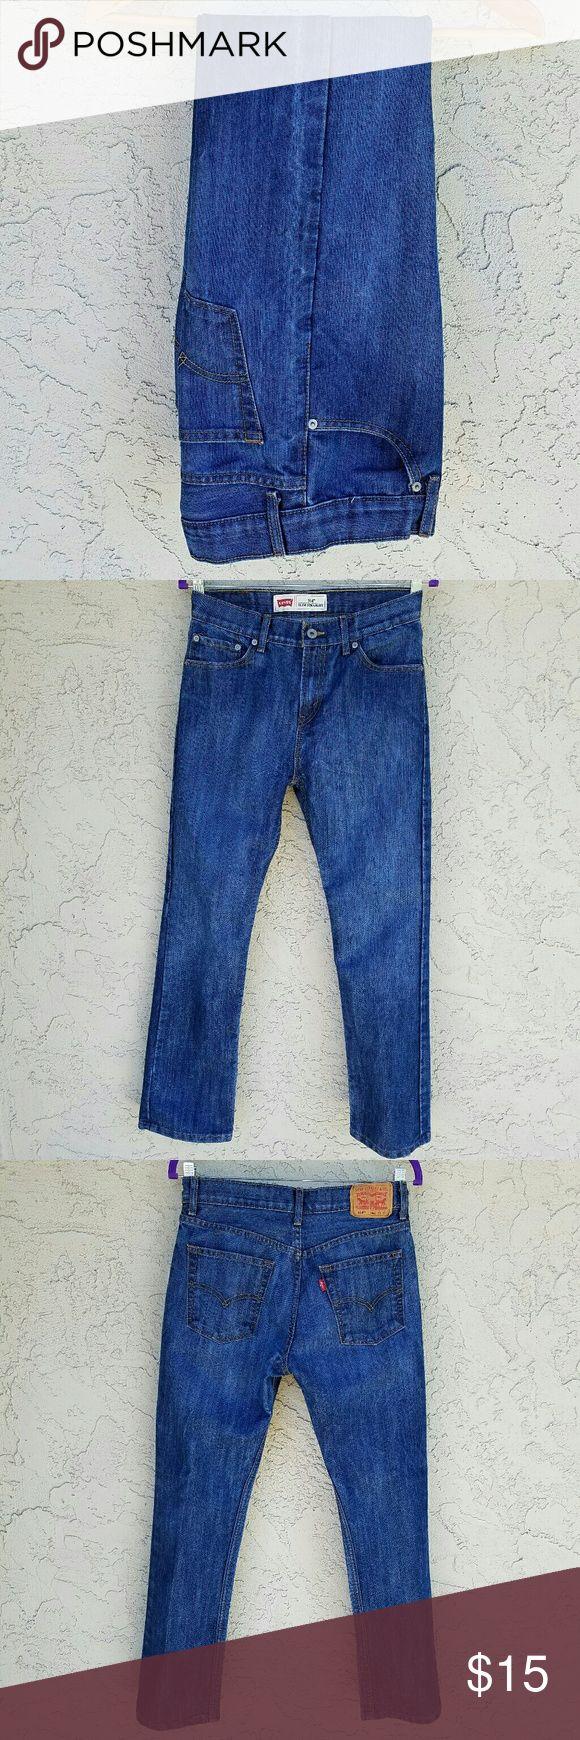 Levi's 514 Slim Straight Blue Jeans. Levi's 514 Slim Straight Darkwash Blue Jeans. EUC  514 18Reg  Waist 29in  Length 29in  Made of 54% Cotton, 46% Polyester Levi's Jeans Slim Straight